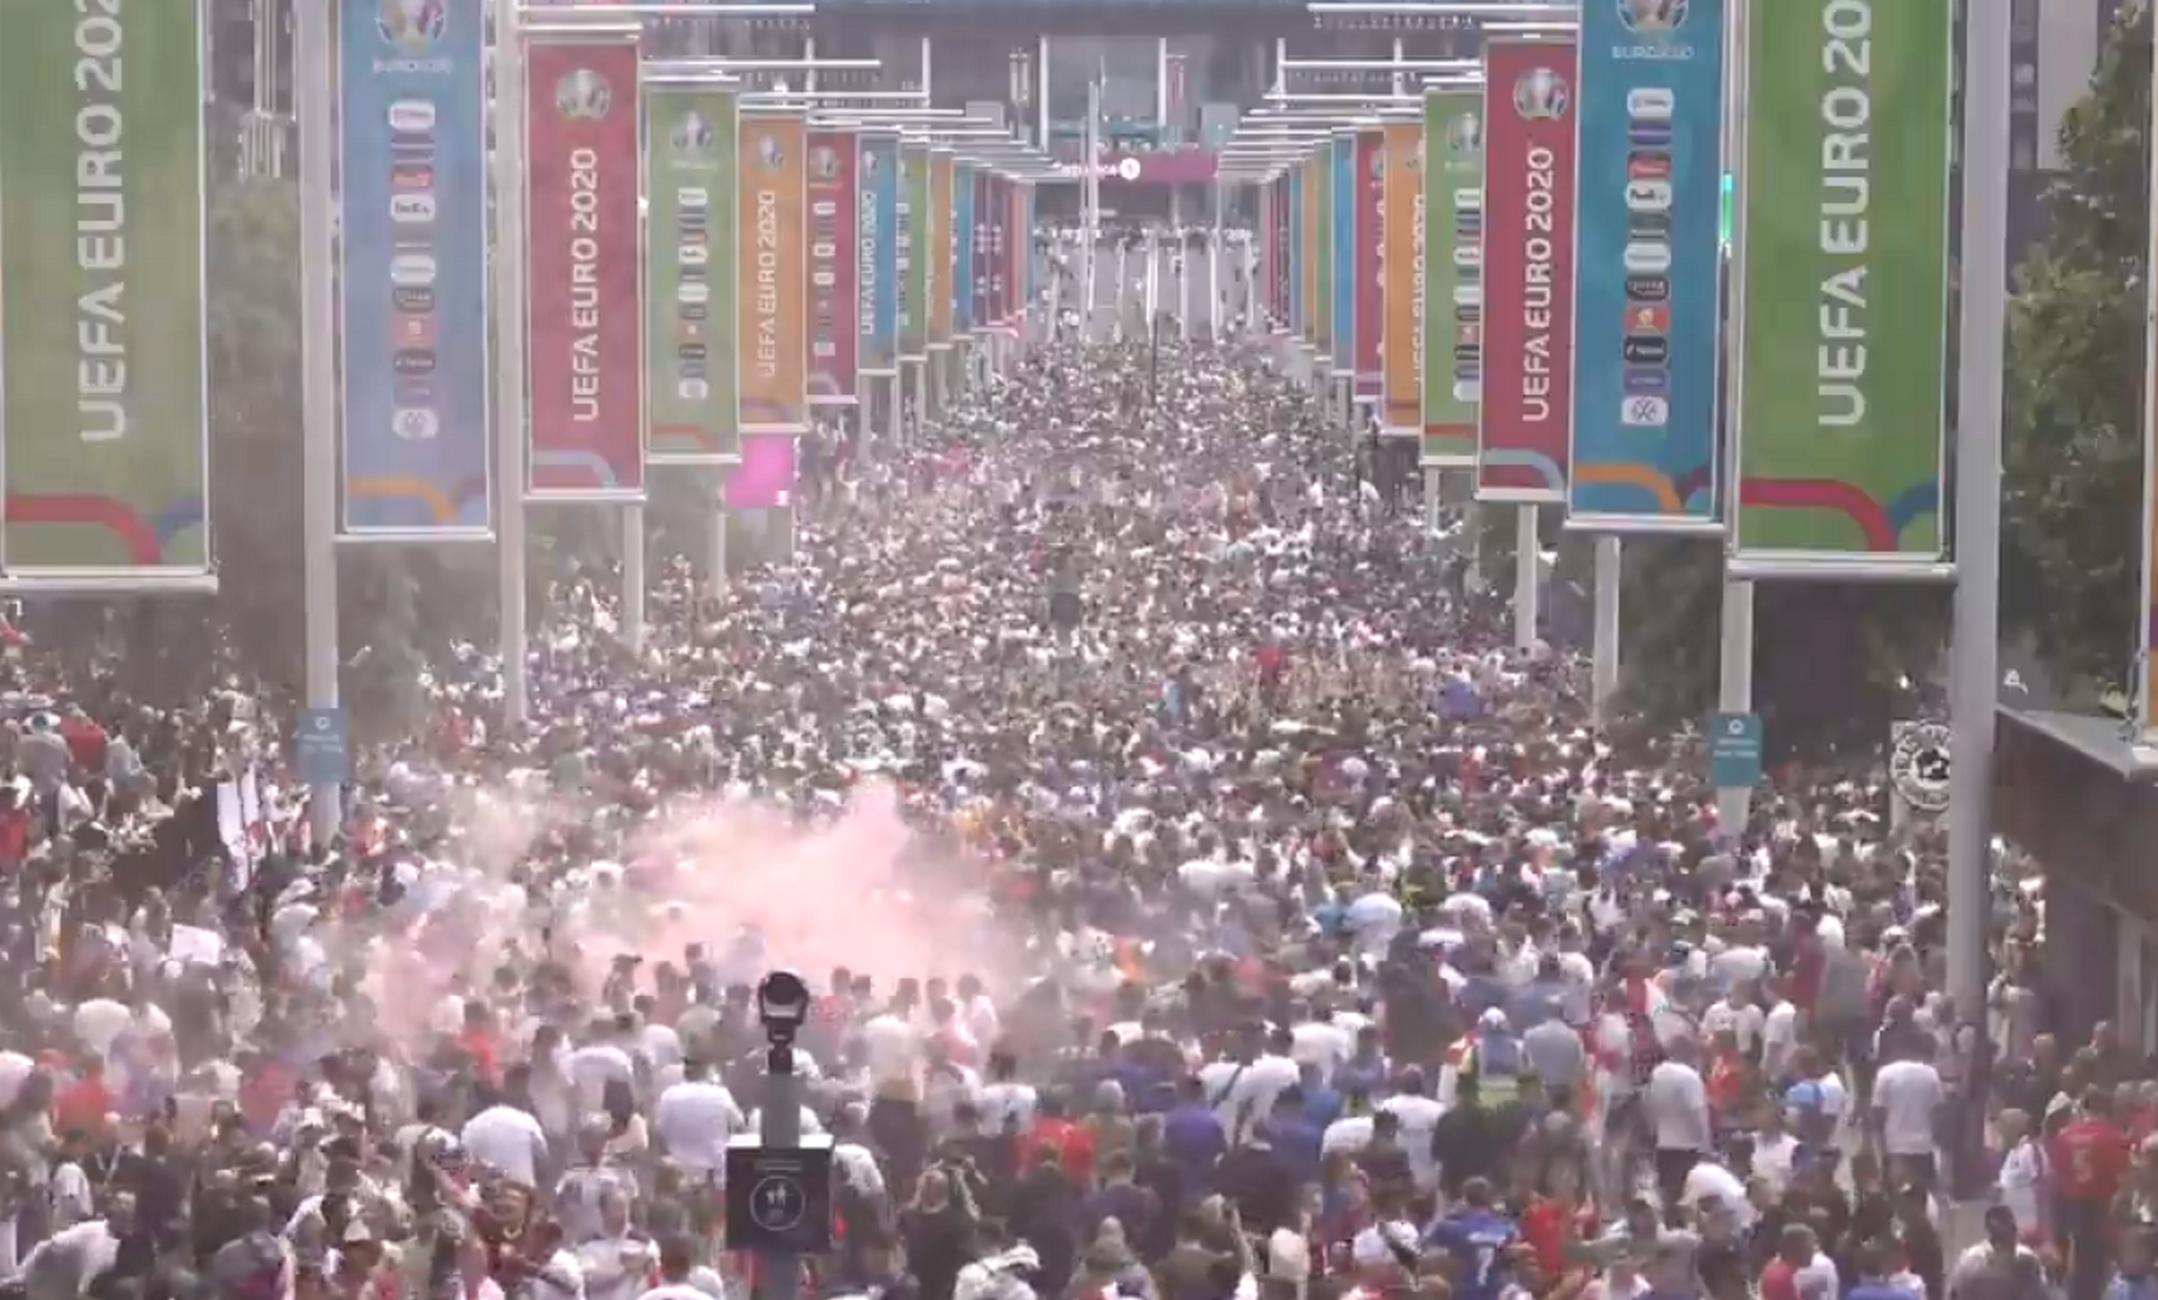 Euro 2020, Ιταλία – Αγγλία: Έχει ξεκινήσει από νωρίς το γλέντι των οπαδών